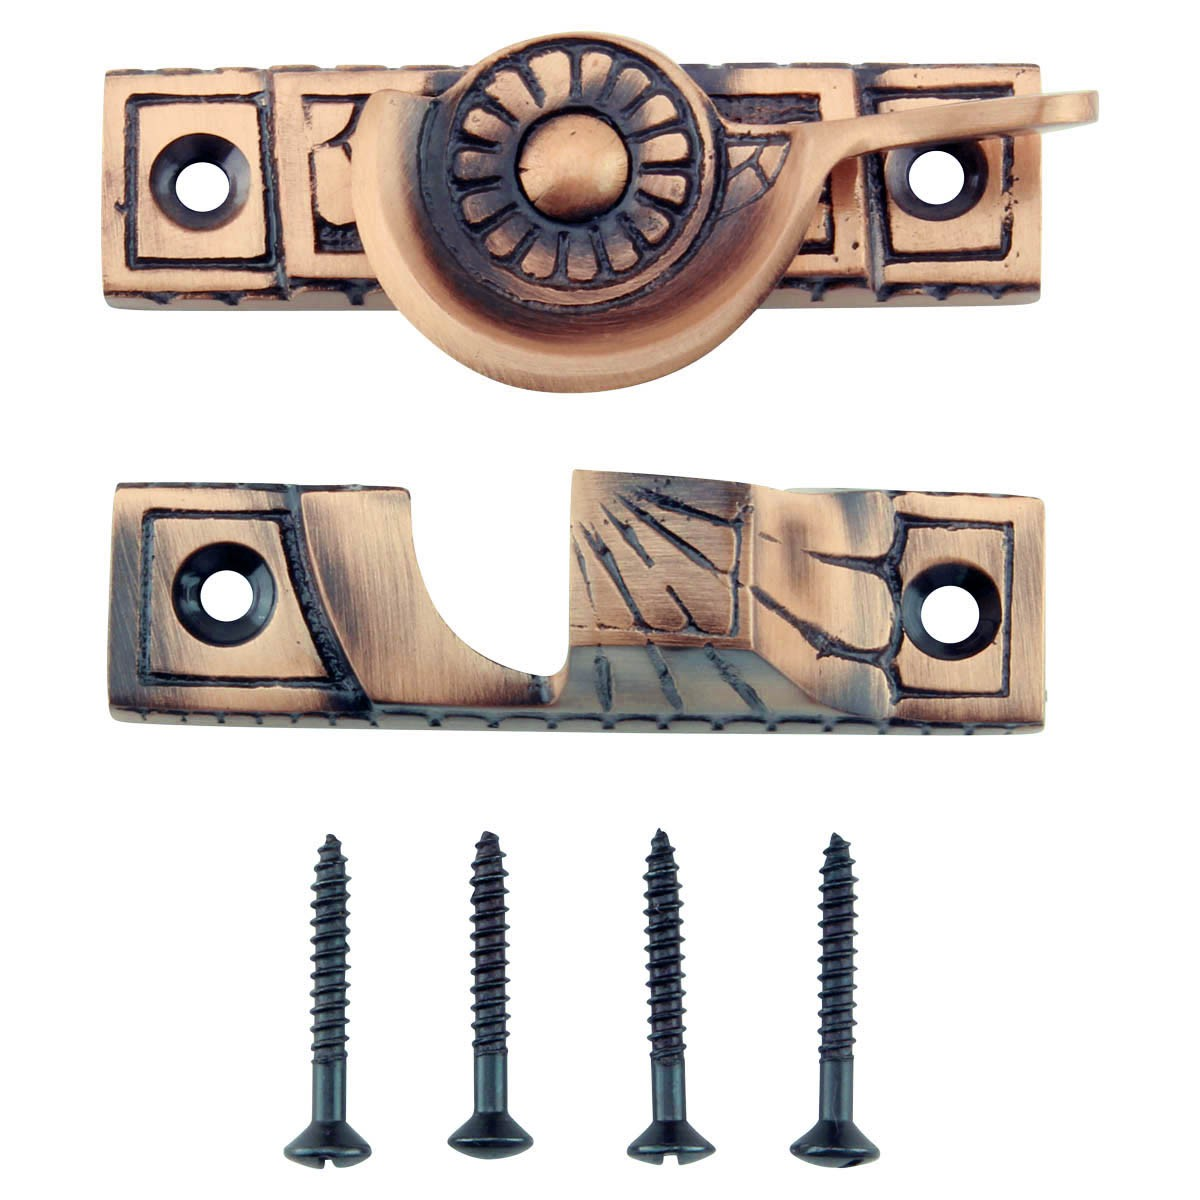 4 Ornate Solid Antique Brass Window Sash Lock Window Pulls Window Lifts Sash Lift